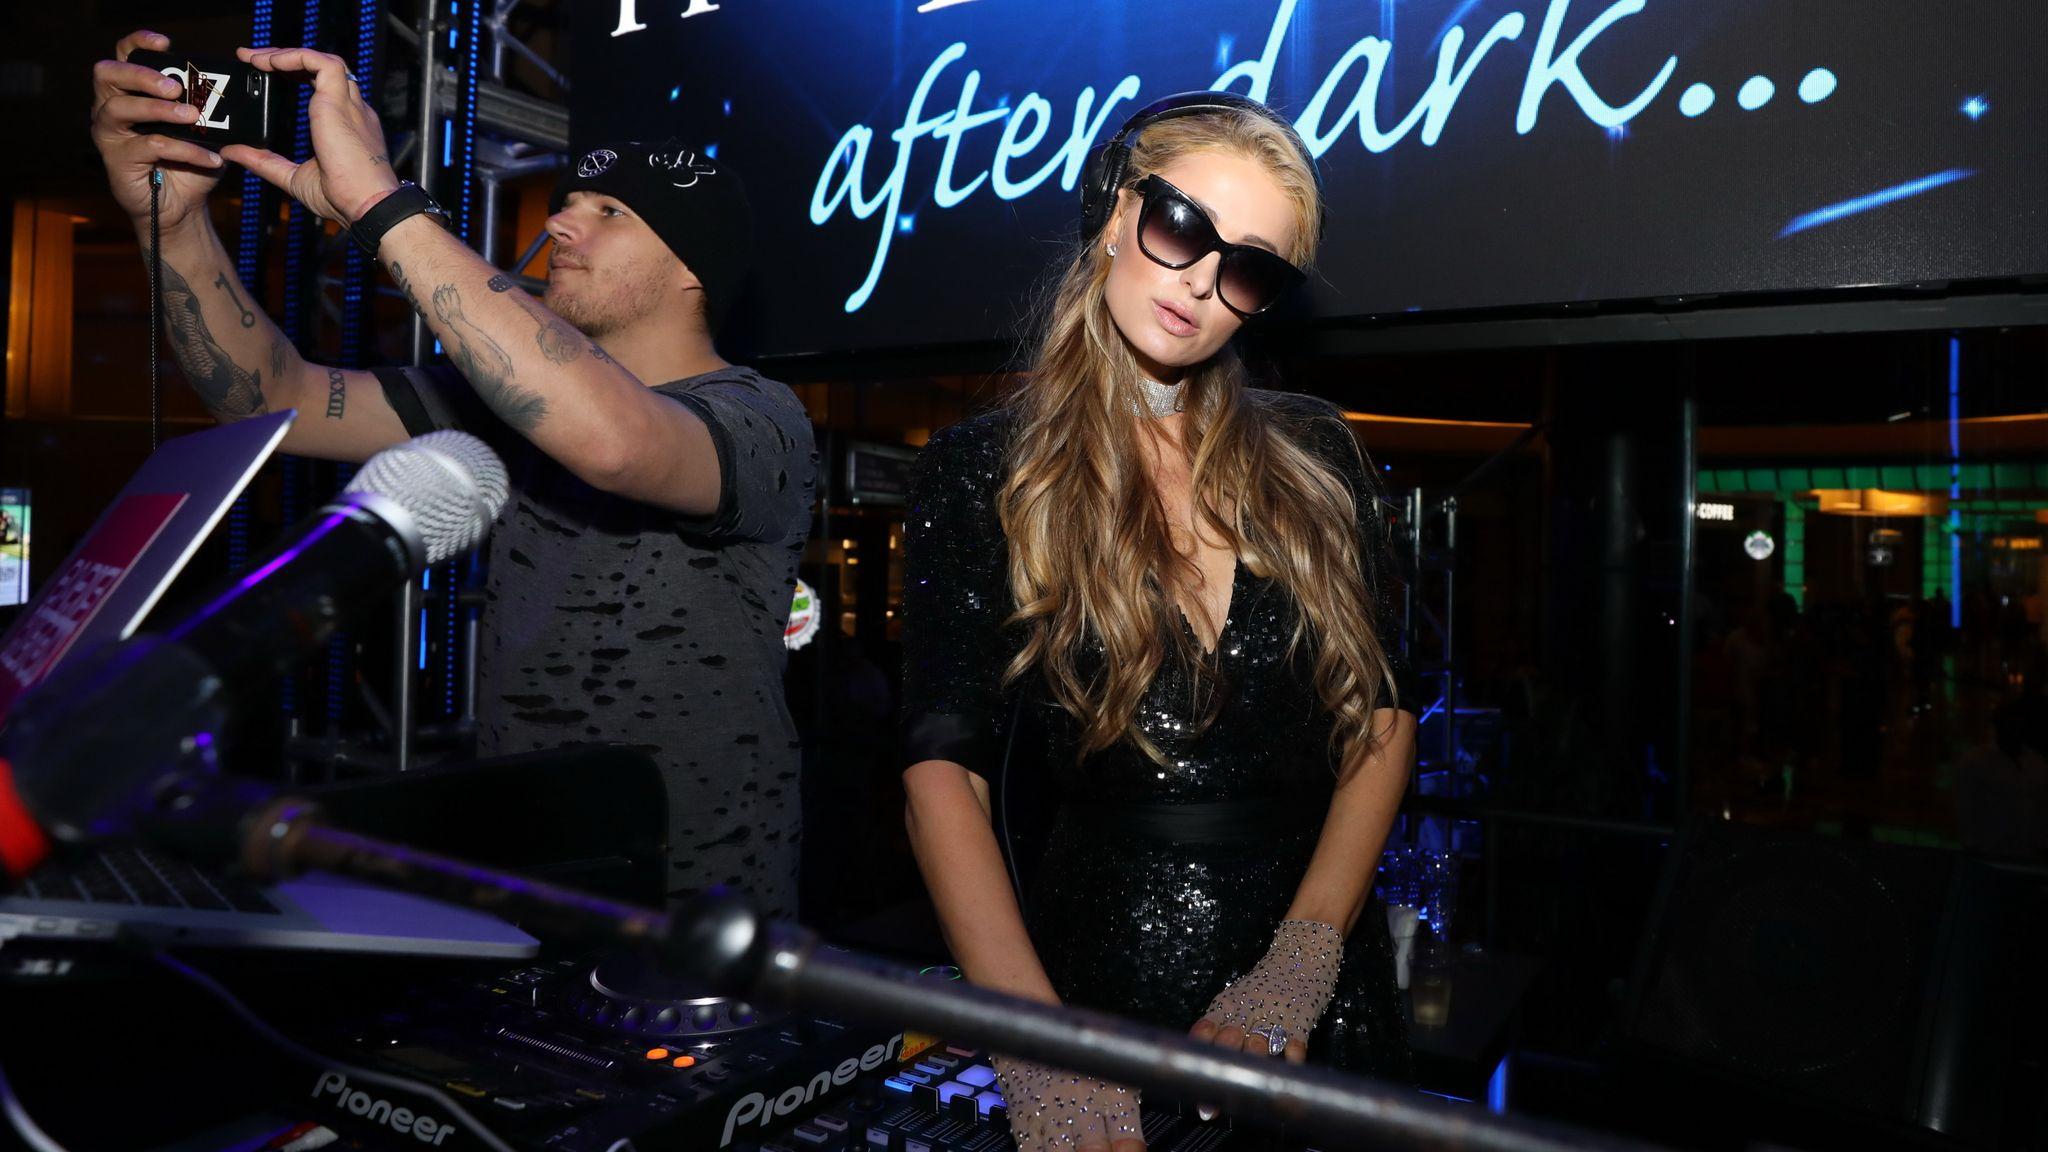 Model, socialite, business woman, singer and DJ, Paris Hilton great-granddaughter of Conrad Hilton Paris Hilton performed a DJ set at The Pool After Dark Harrah...s Atlantic City, NJ on Saturday September 15, 2018